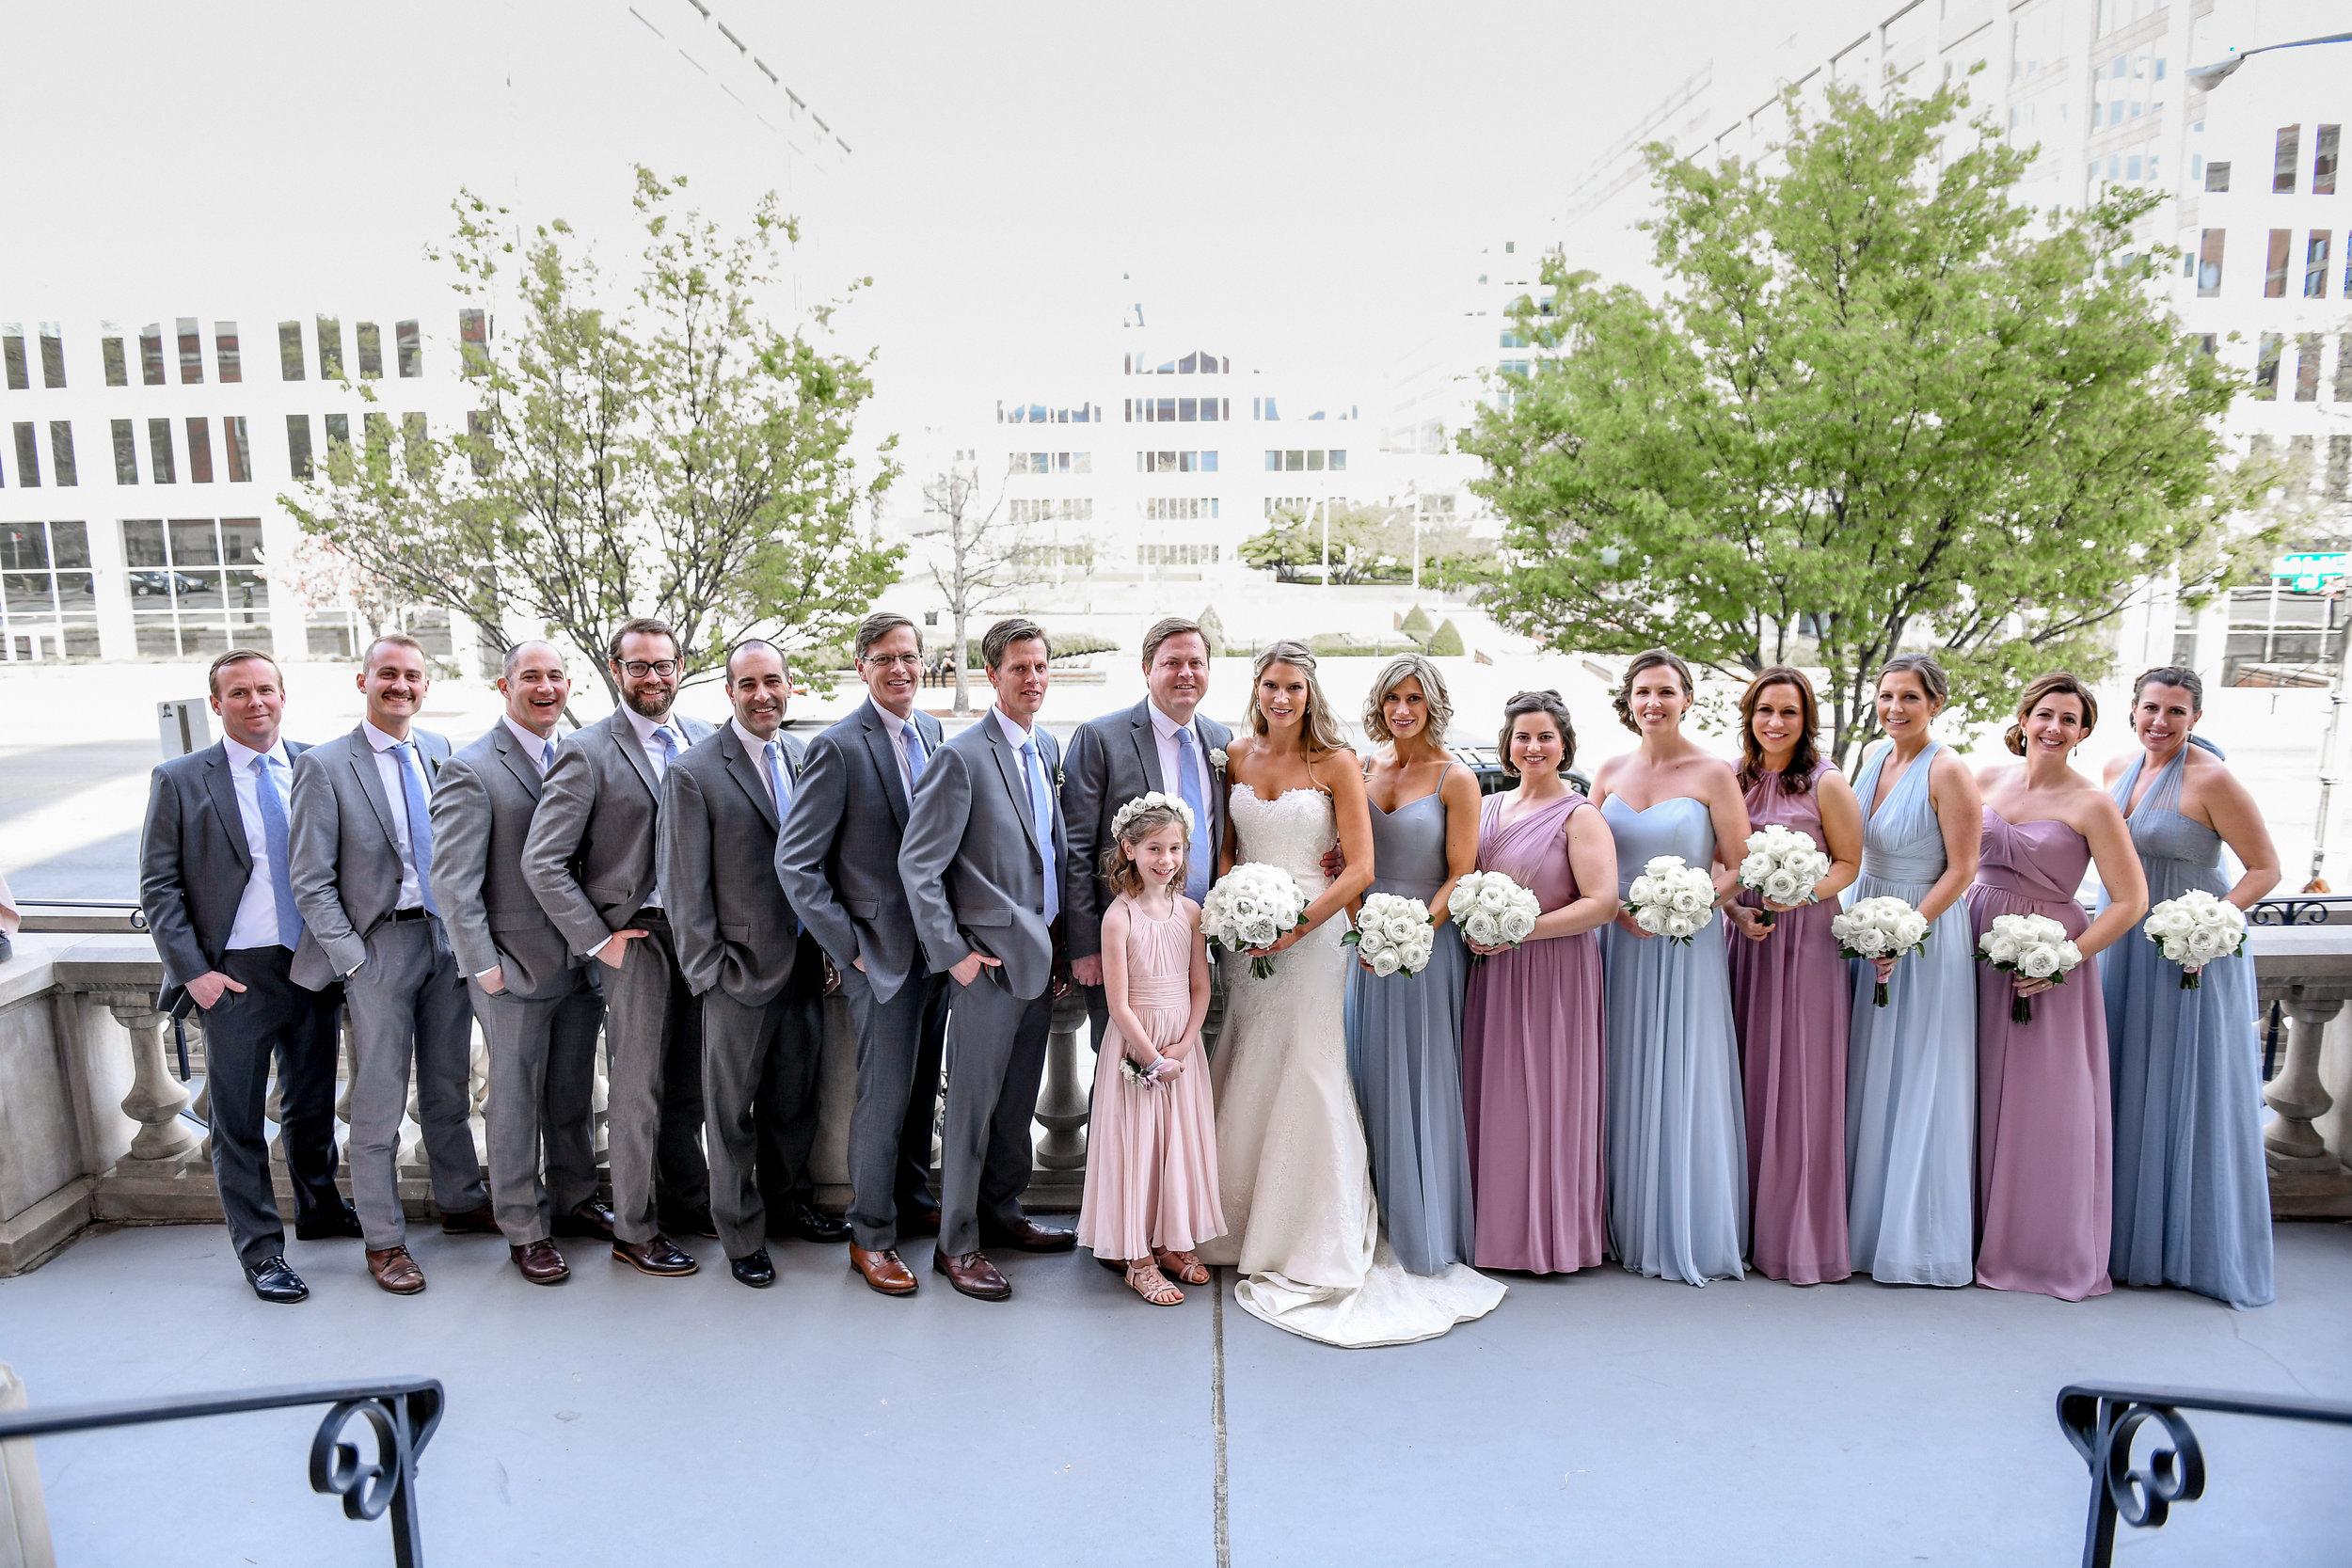 Atelier Ashley Flowers + Erin Tetterton Photography + bridal portrait + bridesmaids bouquetsc + dusty blue + dusty pink